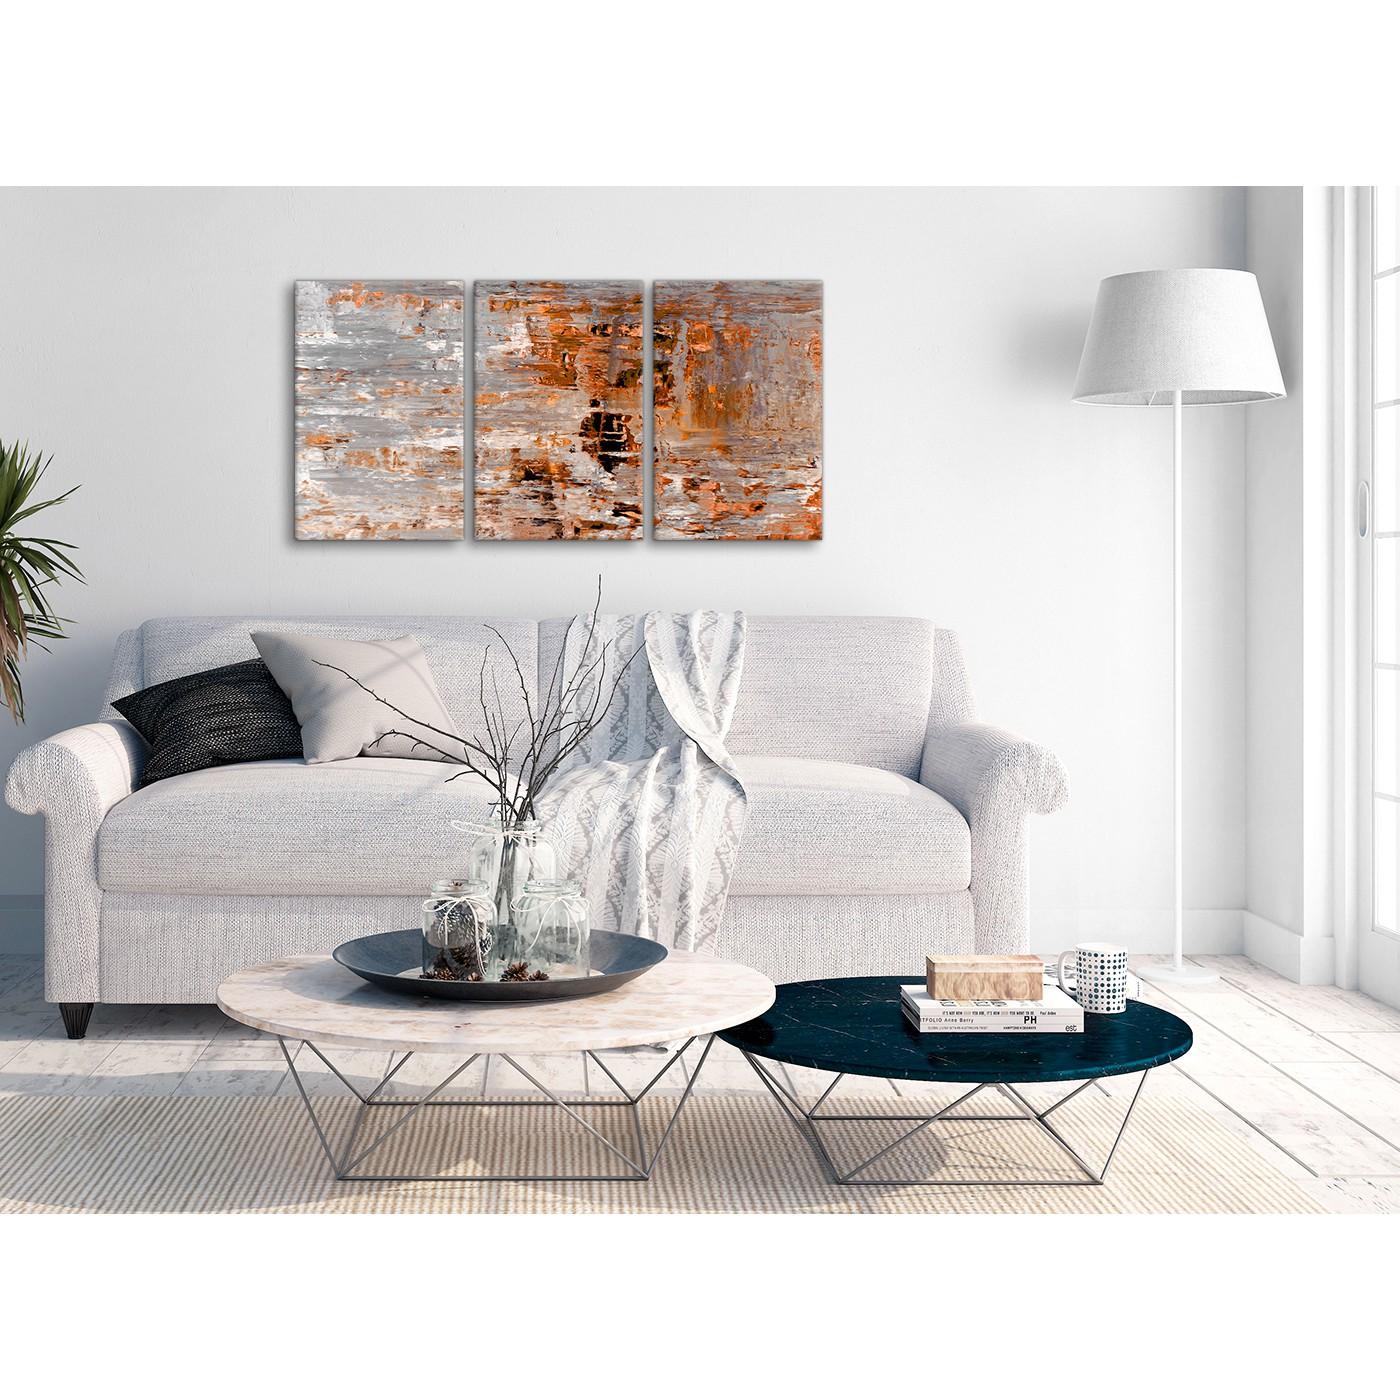 Magnificent Grey Orange Living Room Ideas - Living Room Design Ideas ...